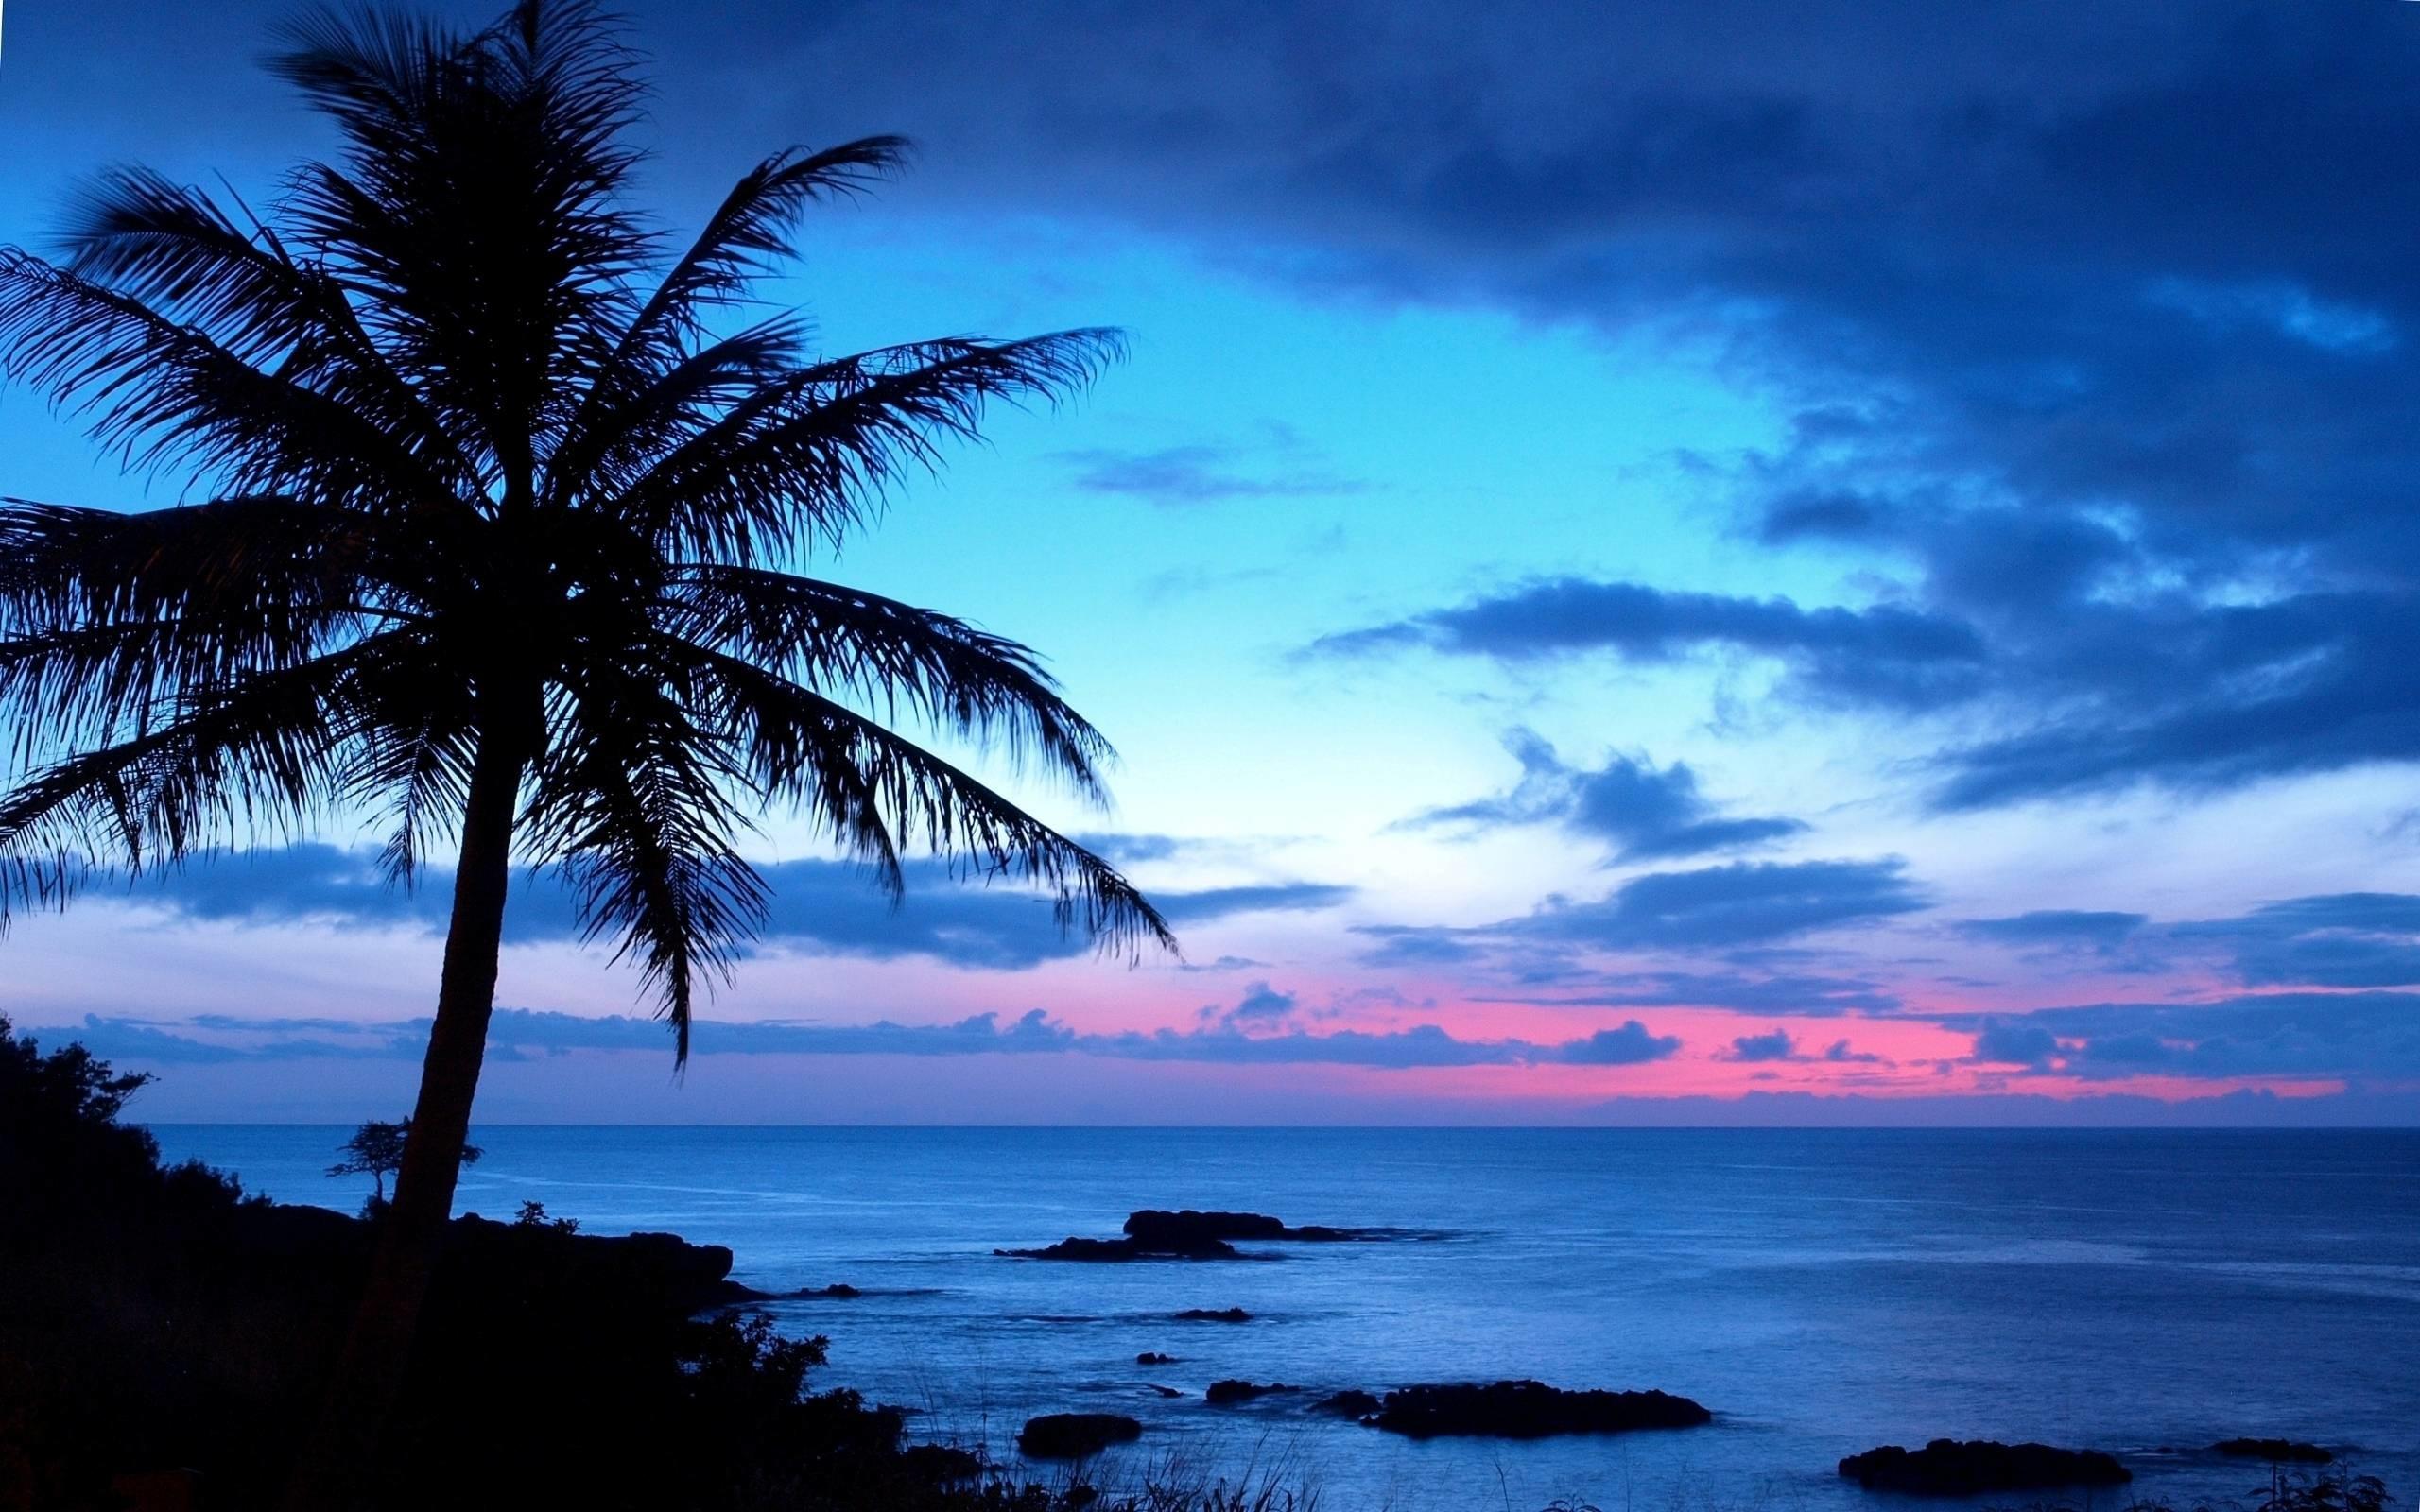 Hawaii Wallpapers – Full HD wallpaper search